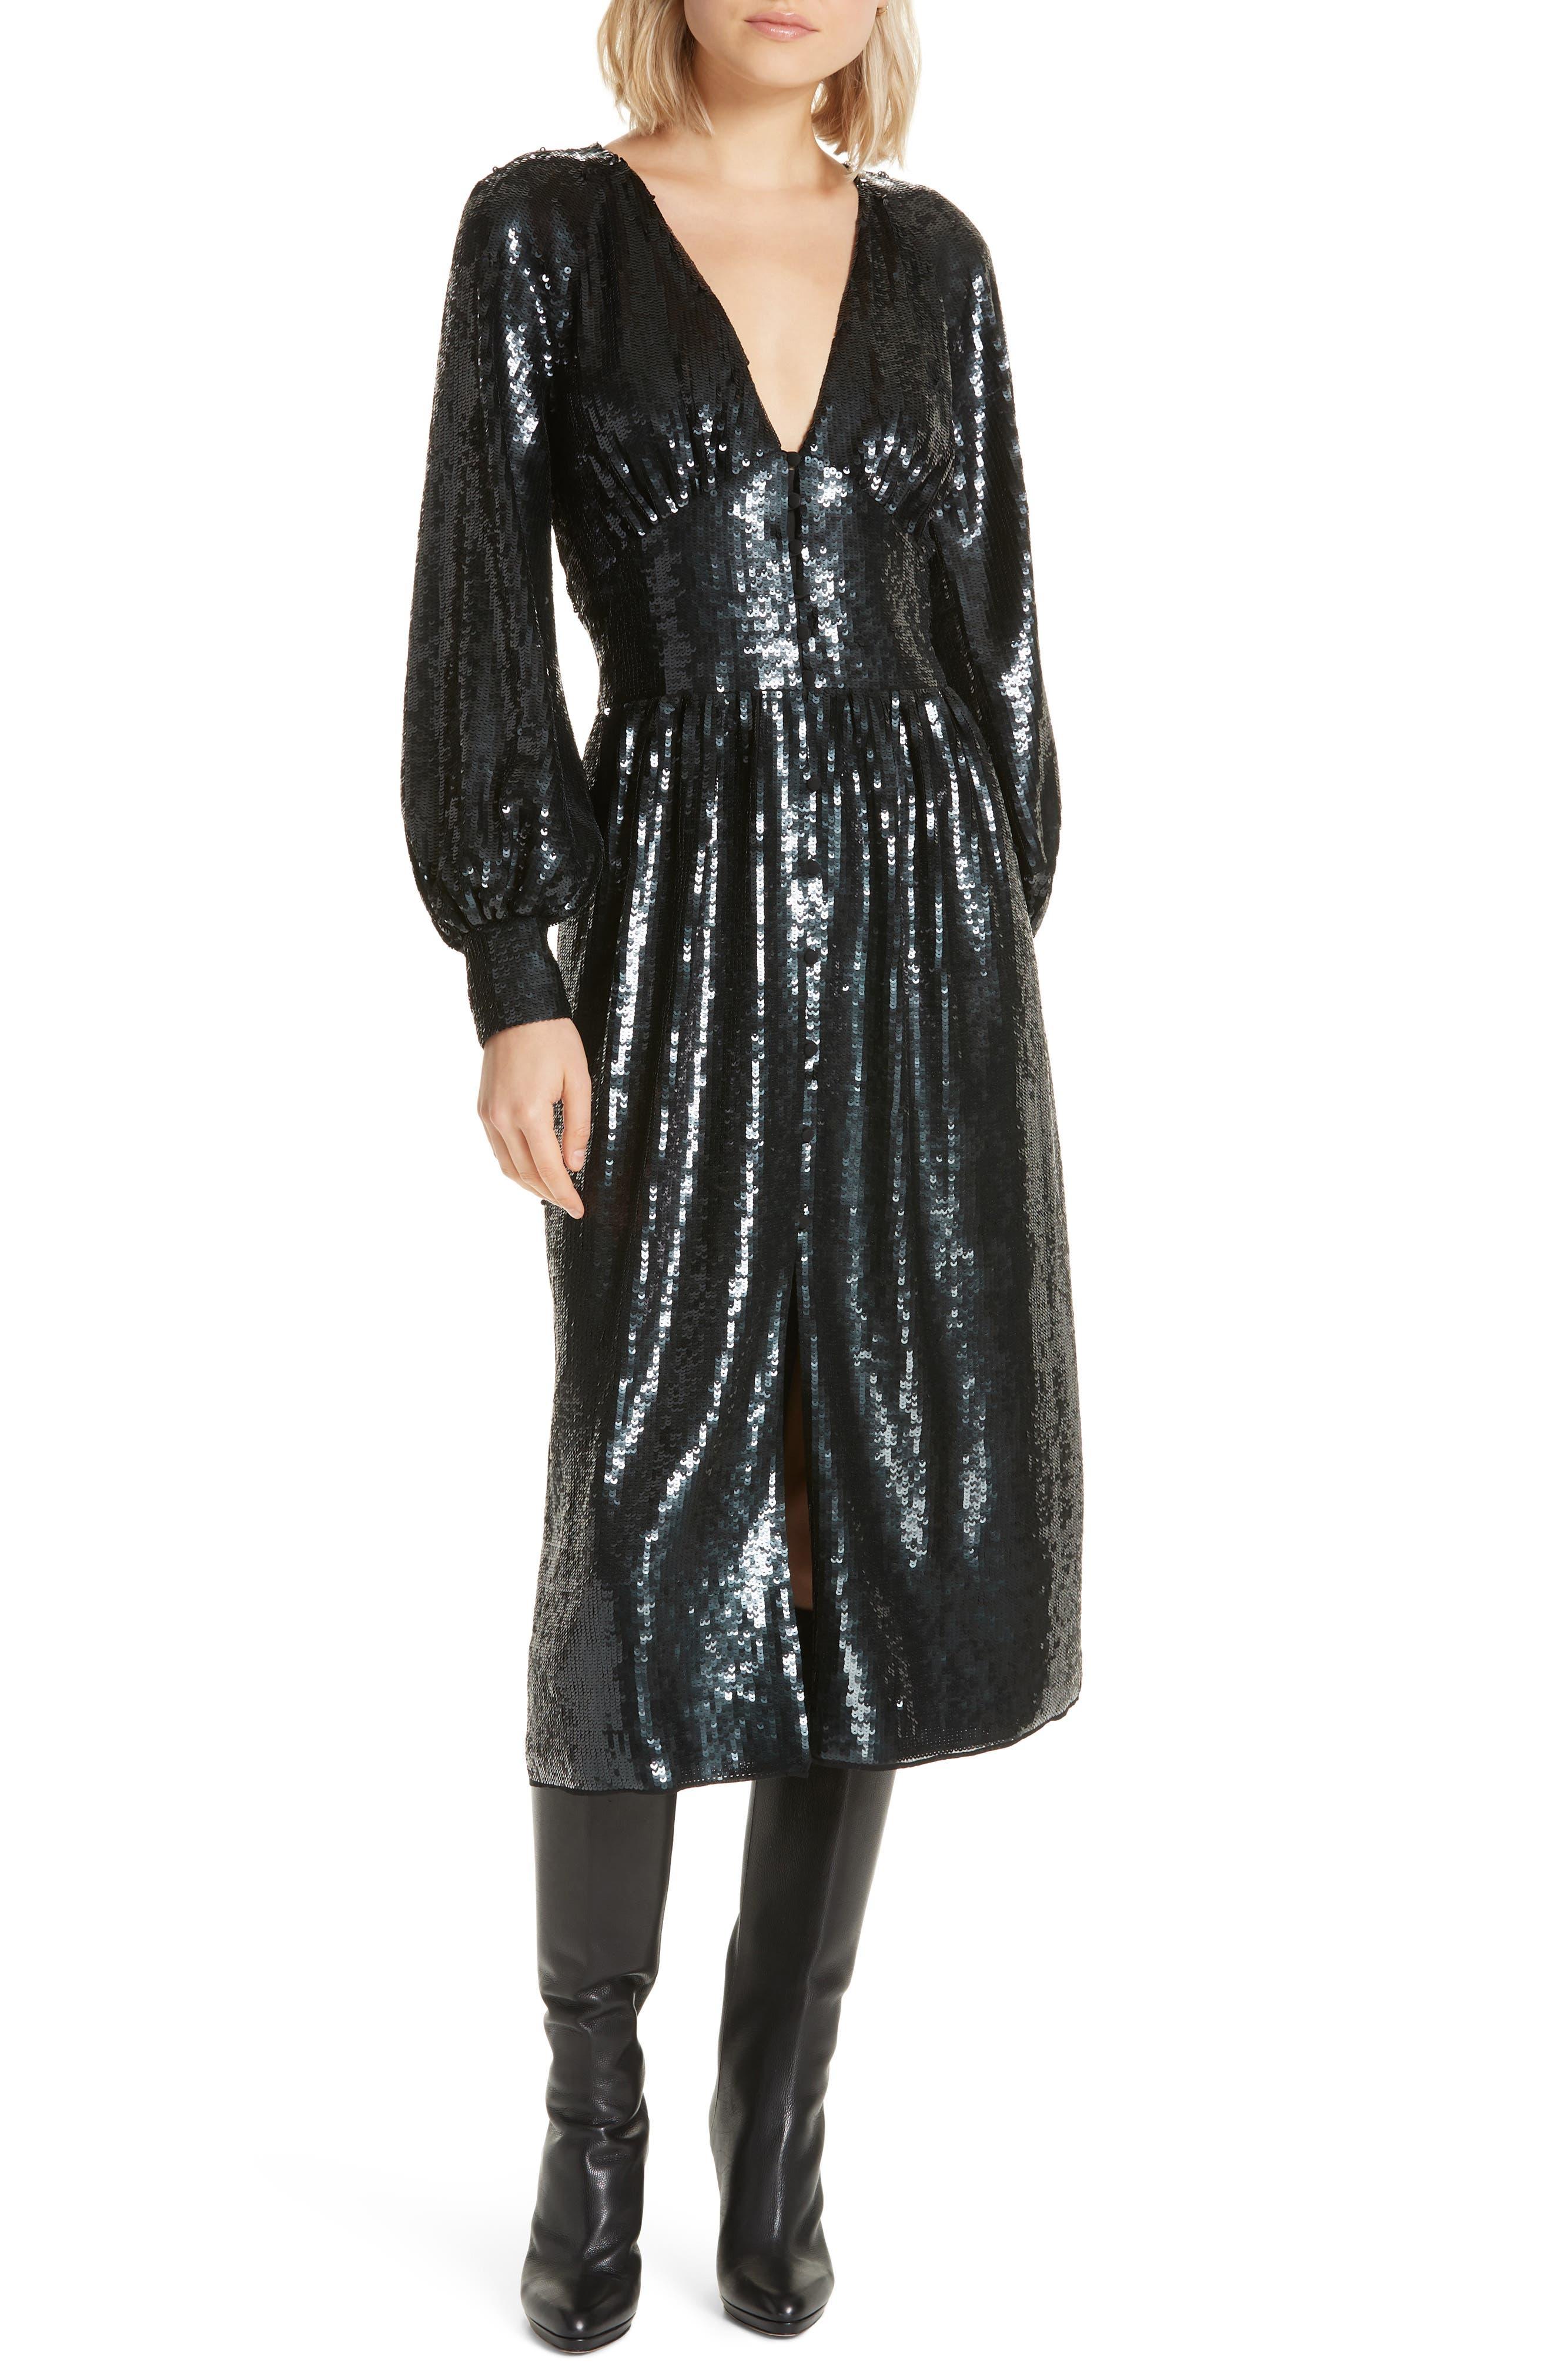 Kyria B Sequin Midi Dress,                             Main thumbnail 1, color,                             001